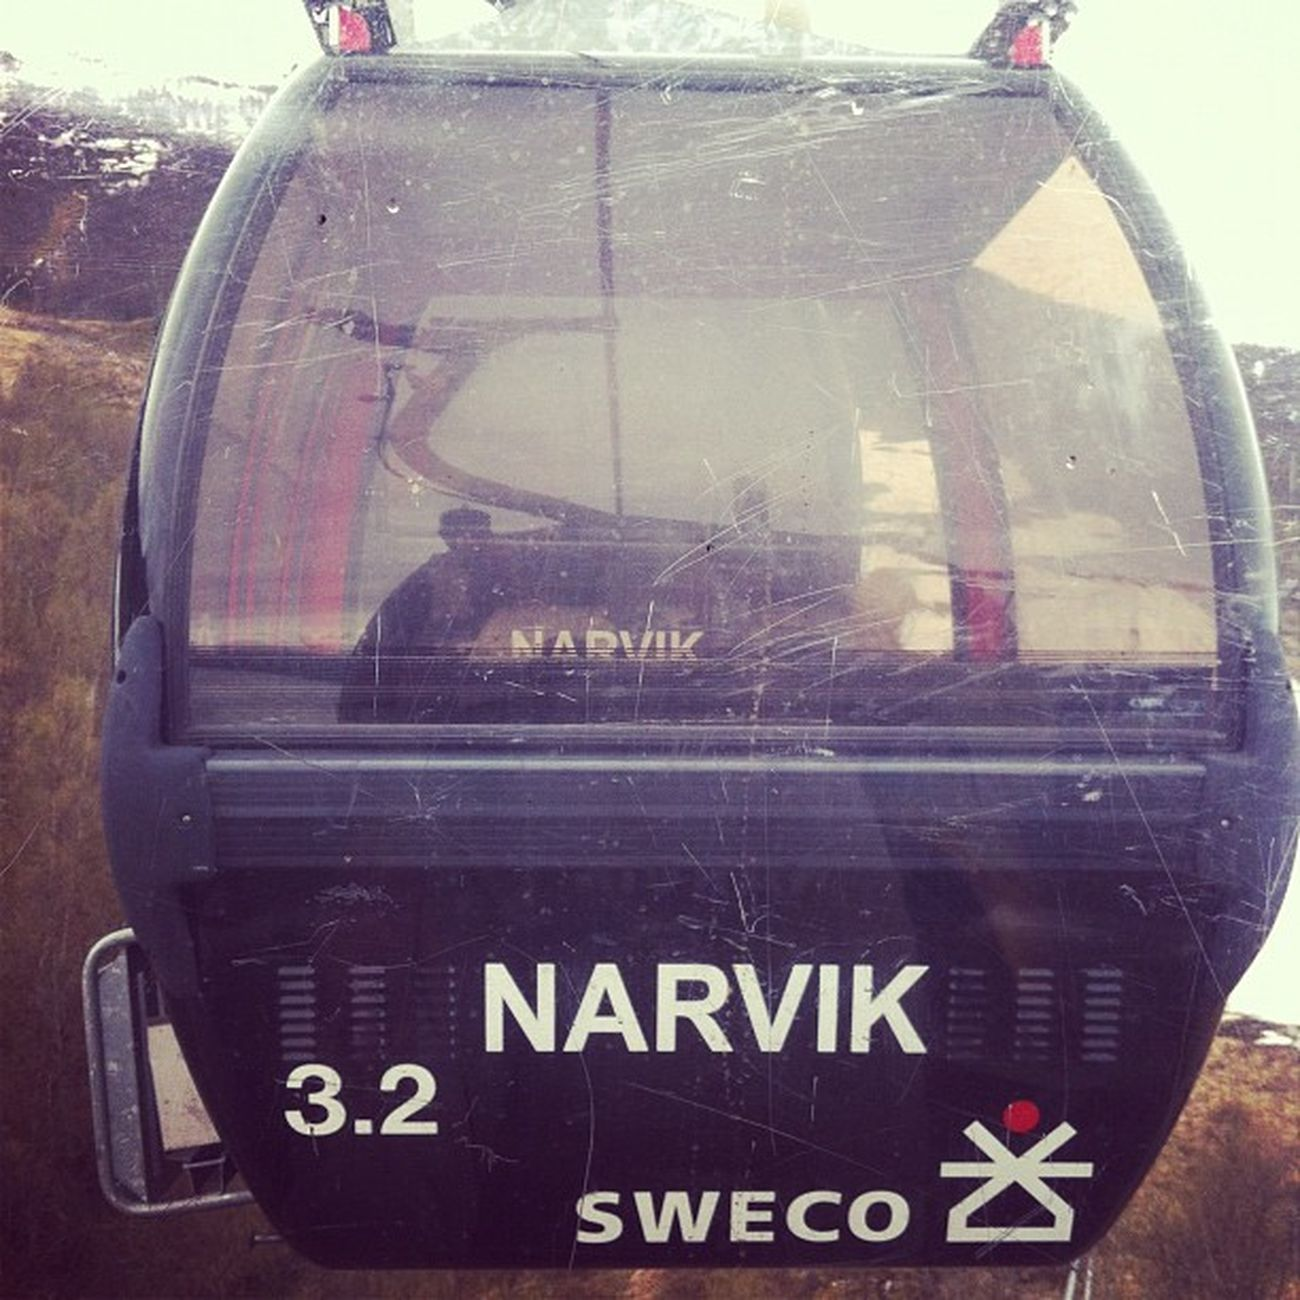 #narvik #cwa #olten Olten Narvik Cwa